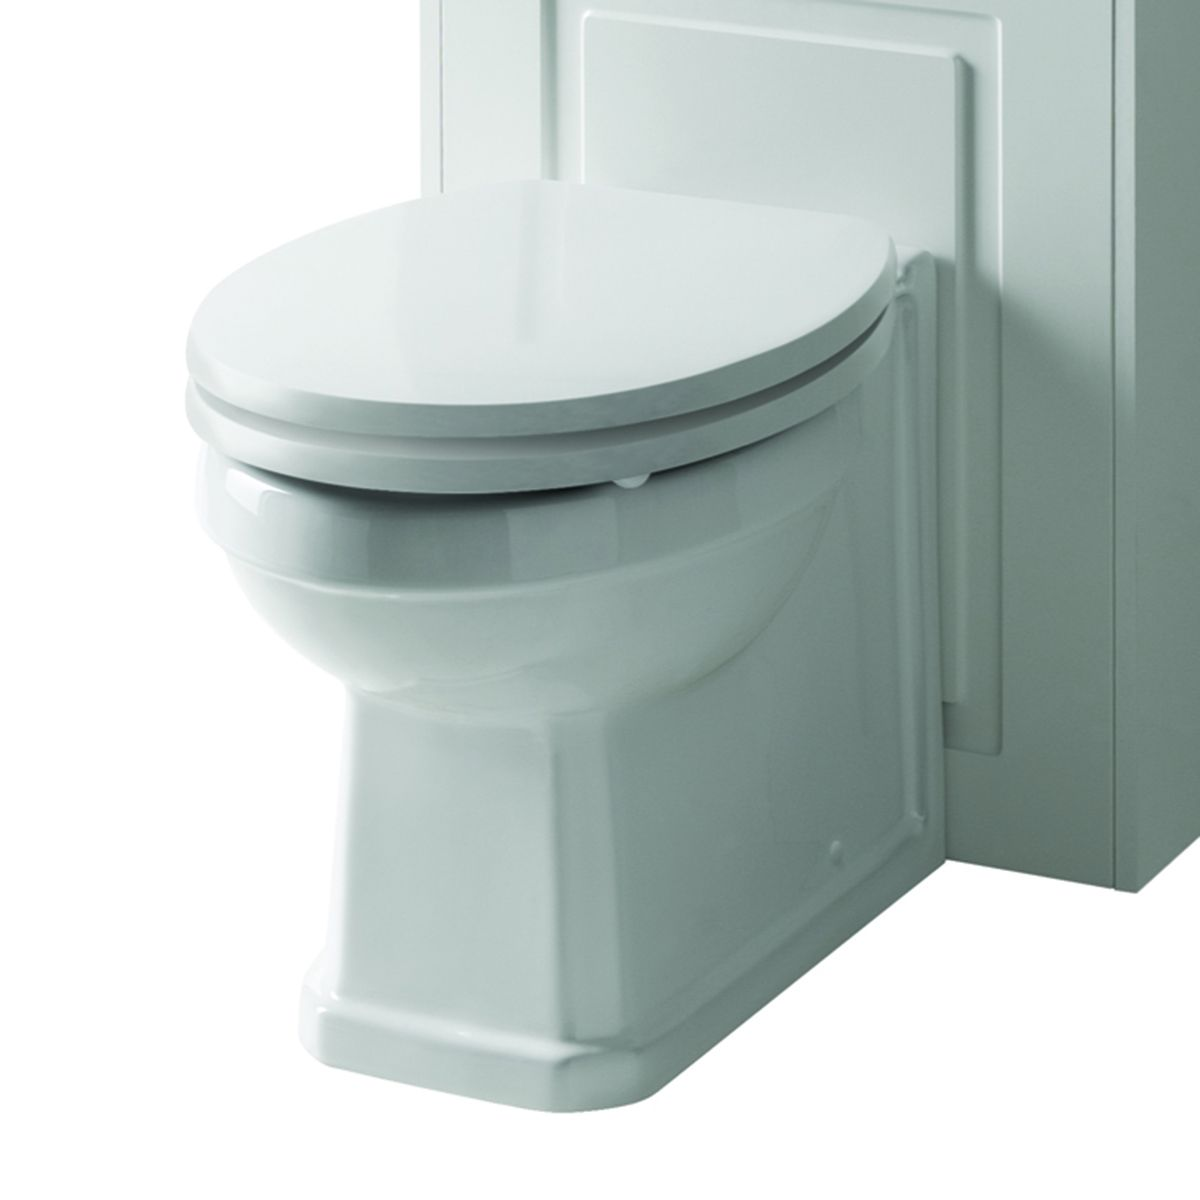 Kartell Astley Matt White Soft Close Toilet Seat